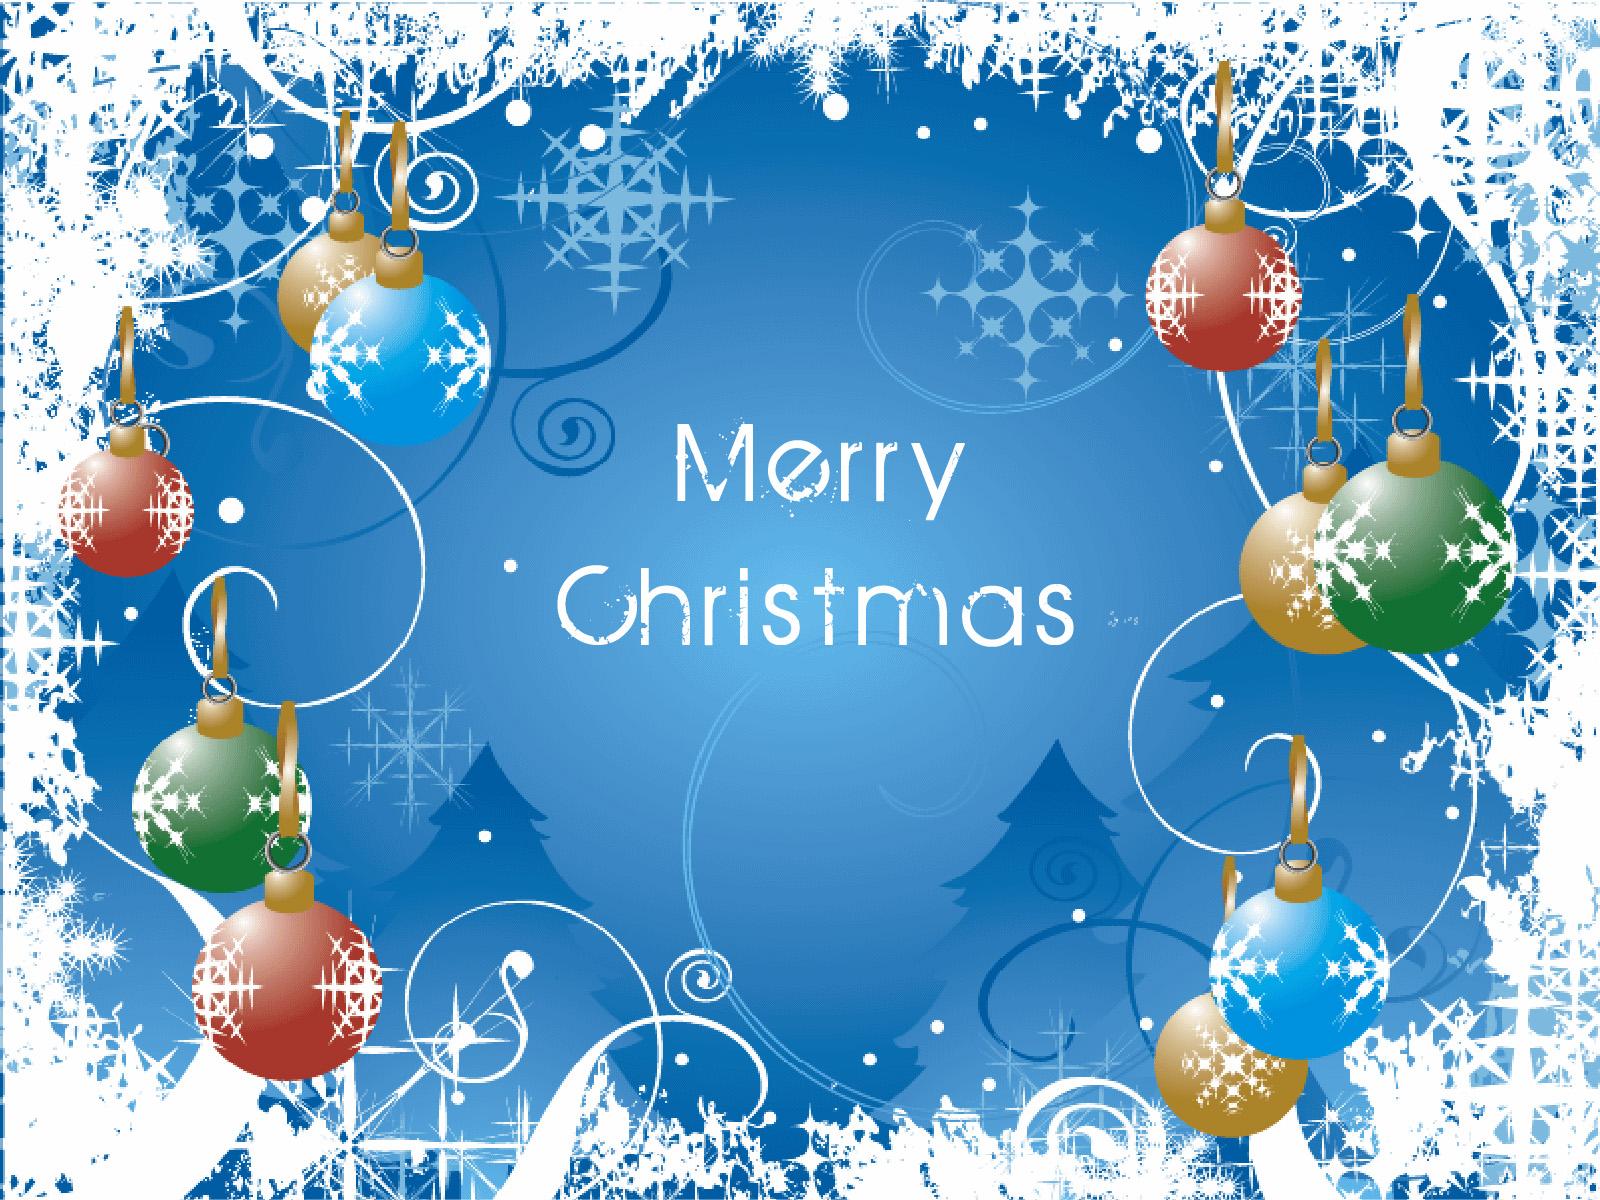 ... merry christmas wallpaper green background merry christmas wallpaper